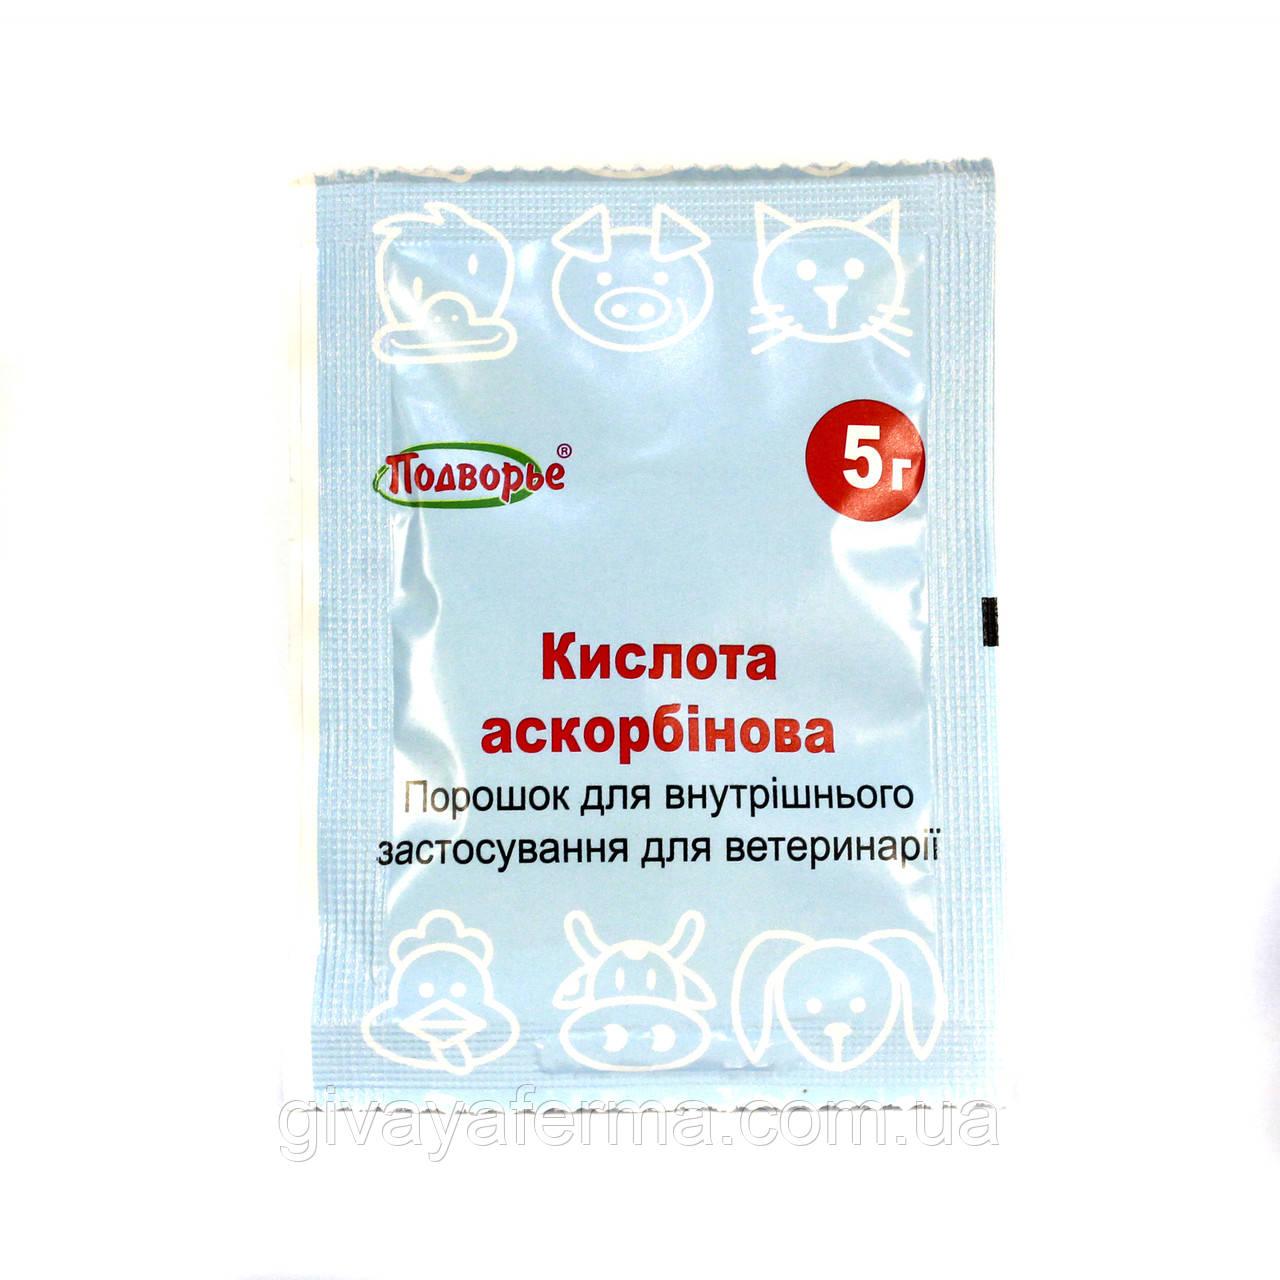 Аскорбиновая кислота - (витамин С), 5 гр